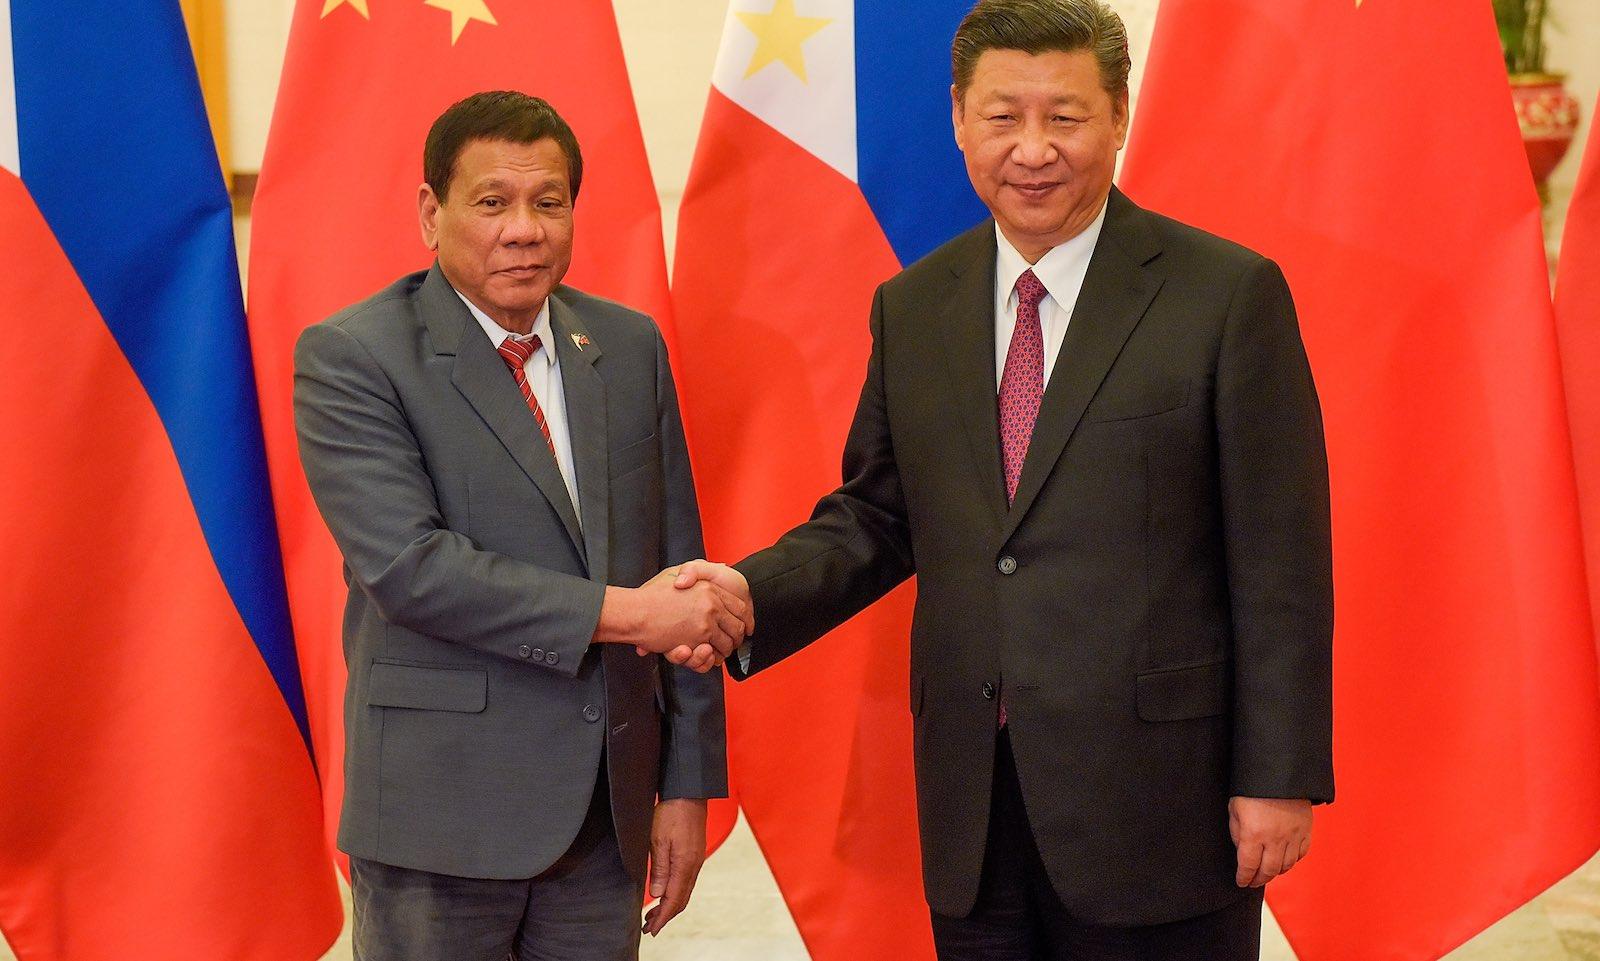 Philippines President Rodrigo Duterte in Beijing meeting China's Xi Jinping in 2017 (Photo: Etienne Oliveau/Getty)